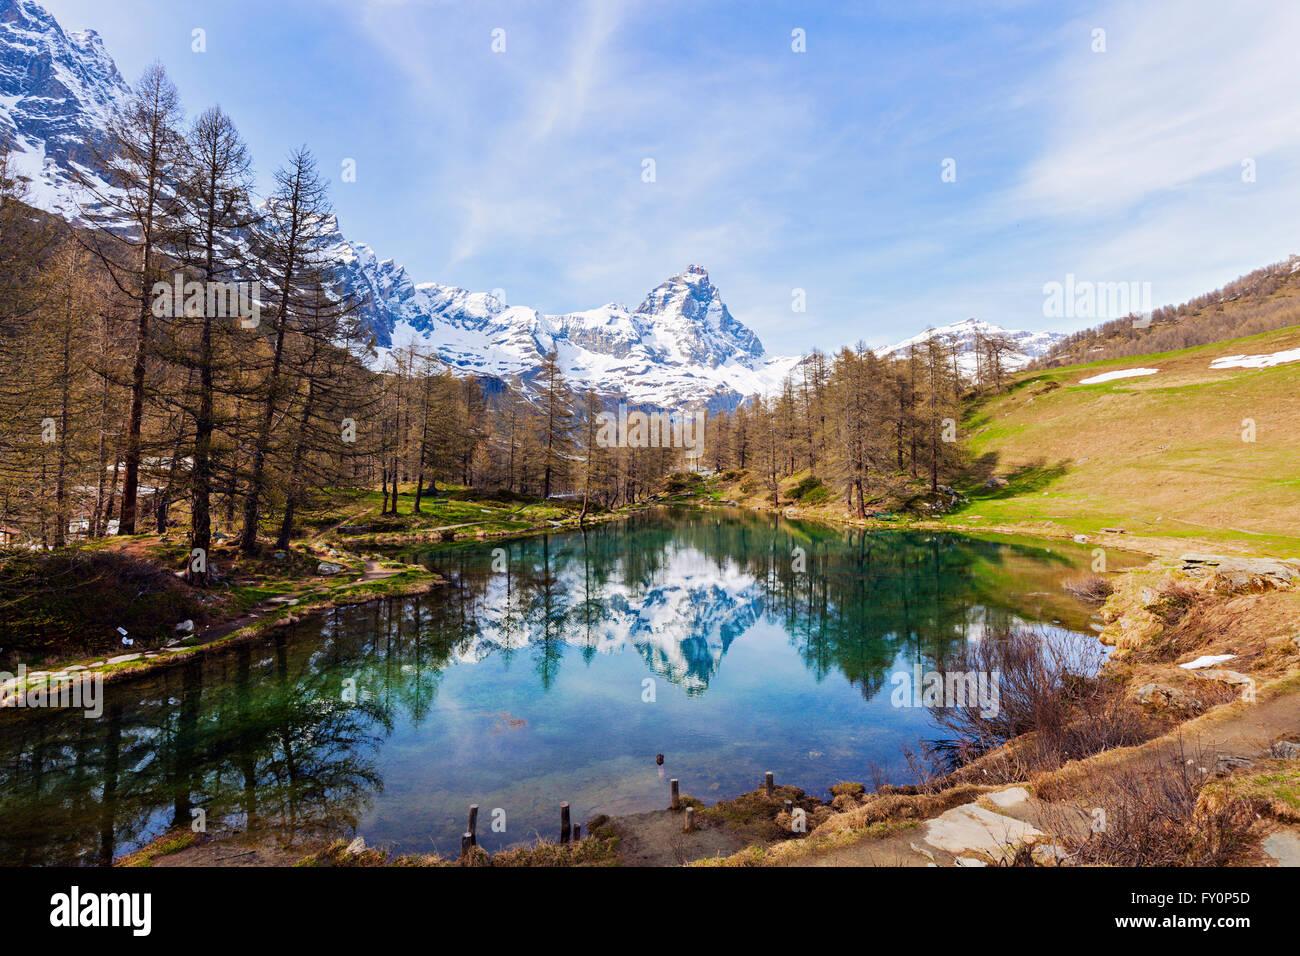 Matterhorn reflected in Blue Lake - Stock Image